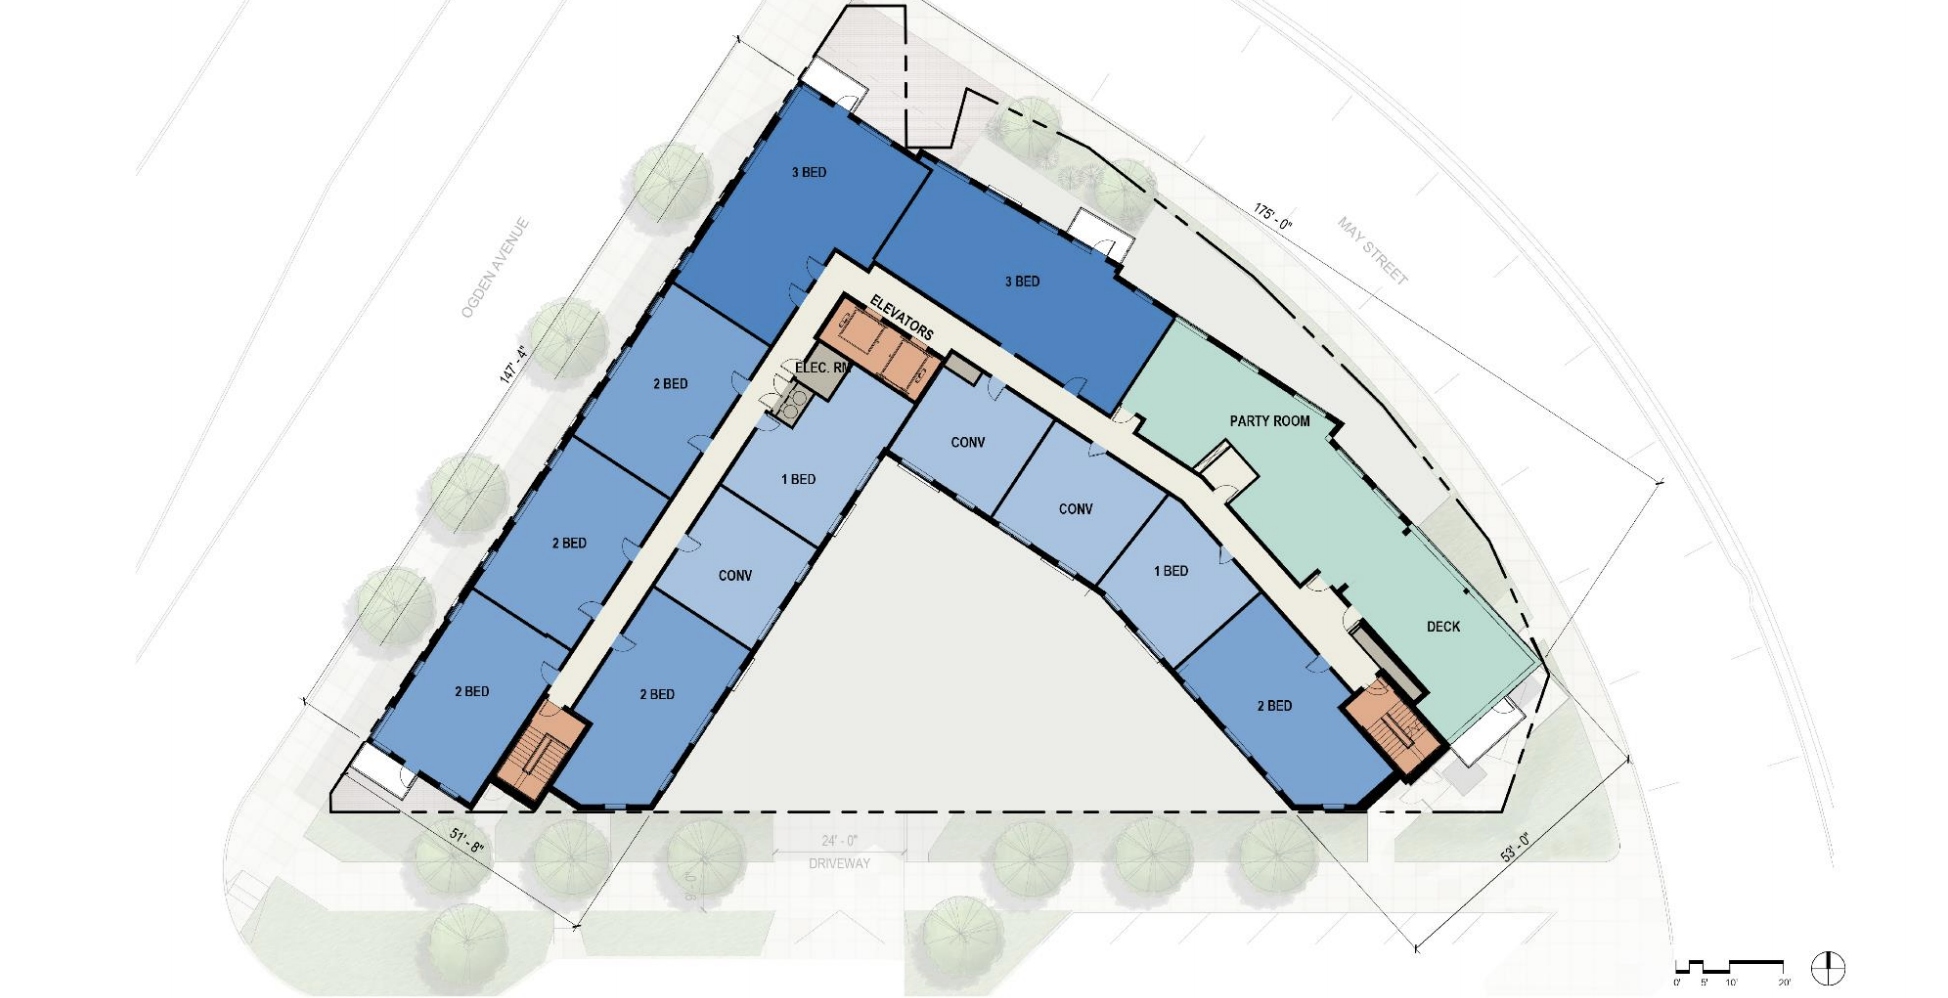 Inspire West Town eighth floor plan